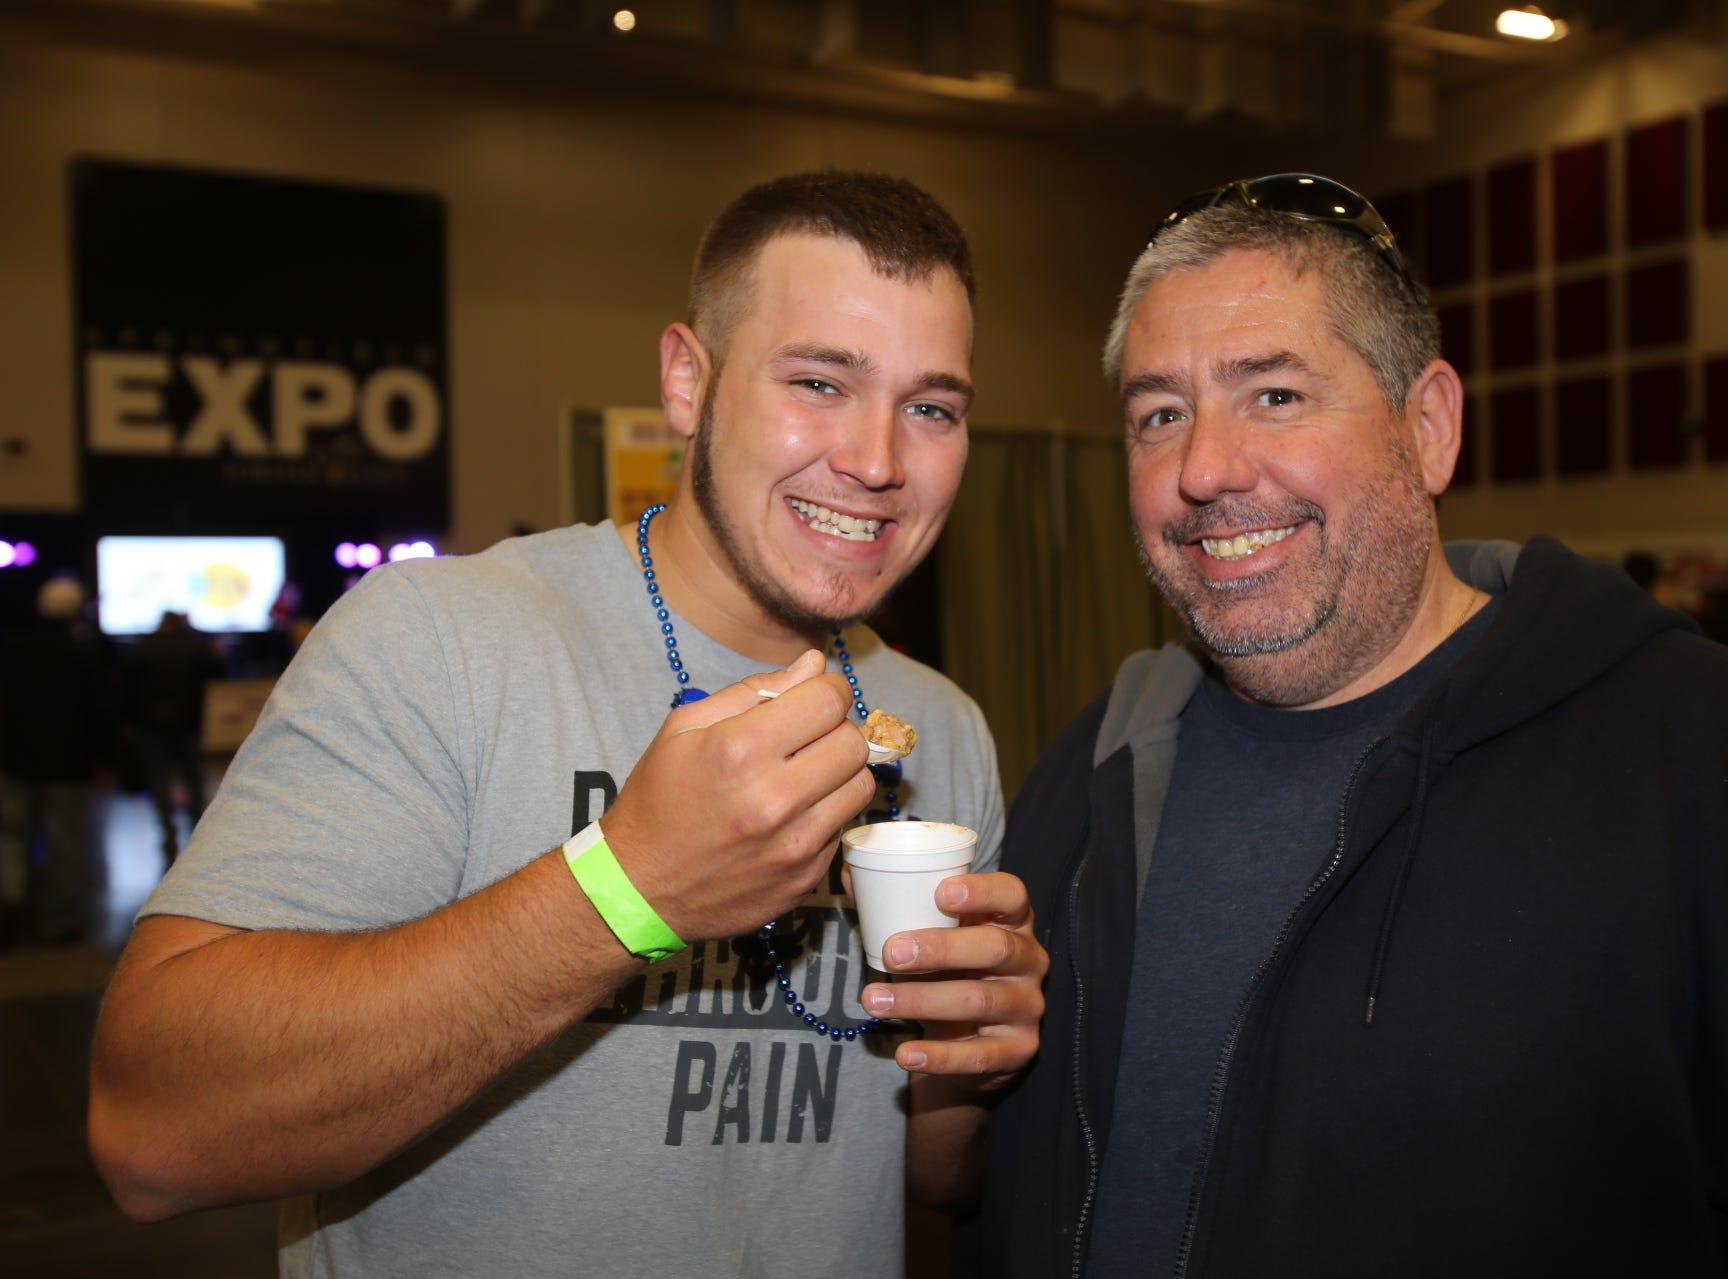 Randy Beeson and Matt Cowin